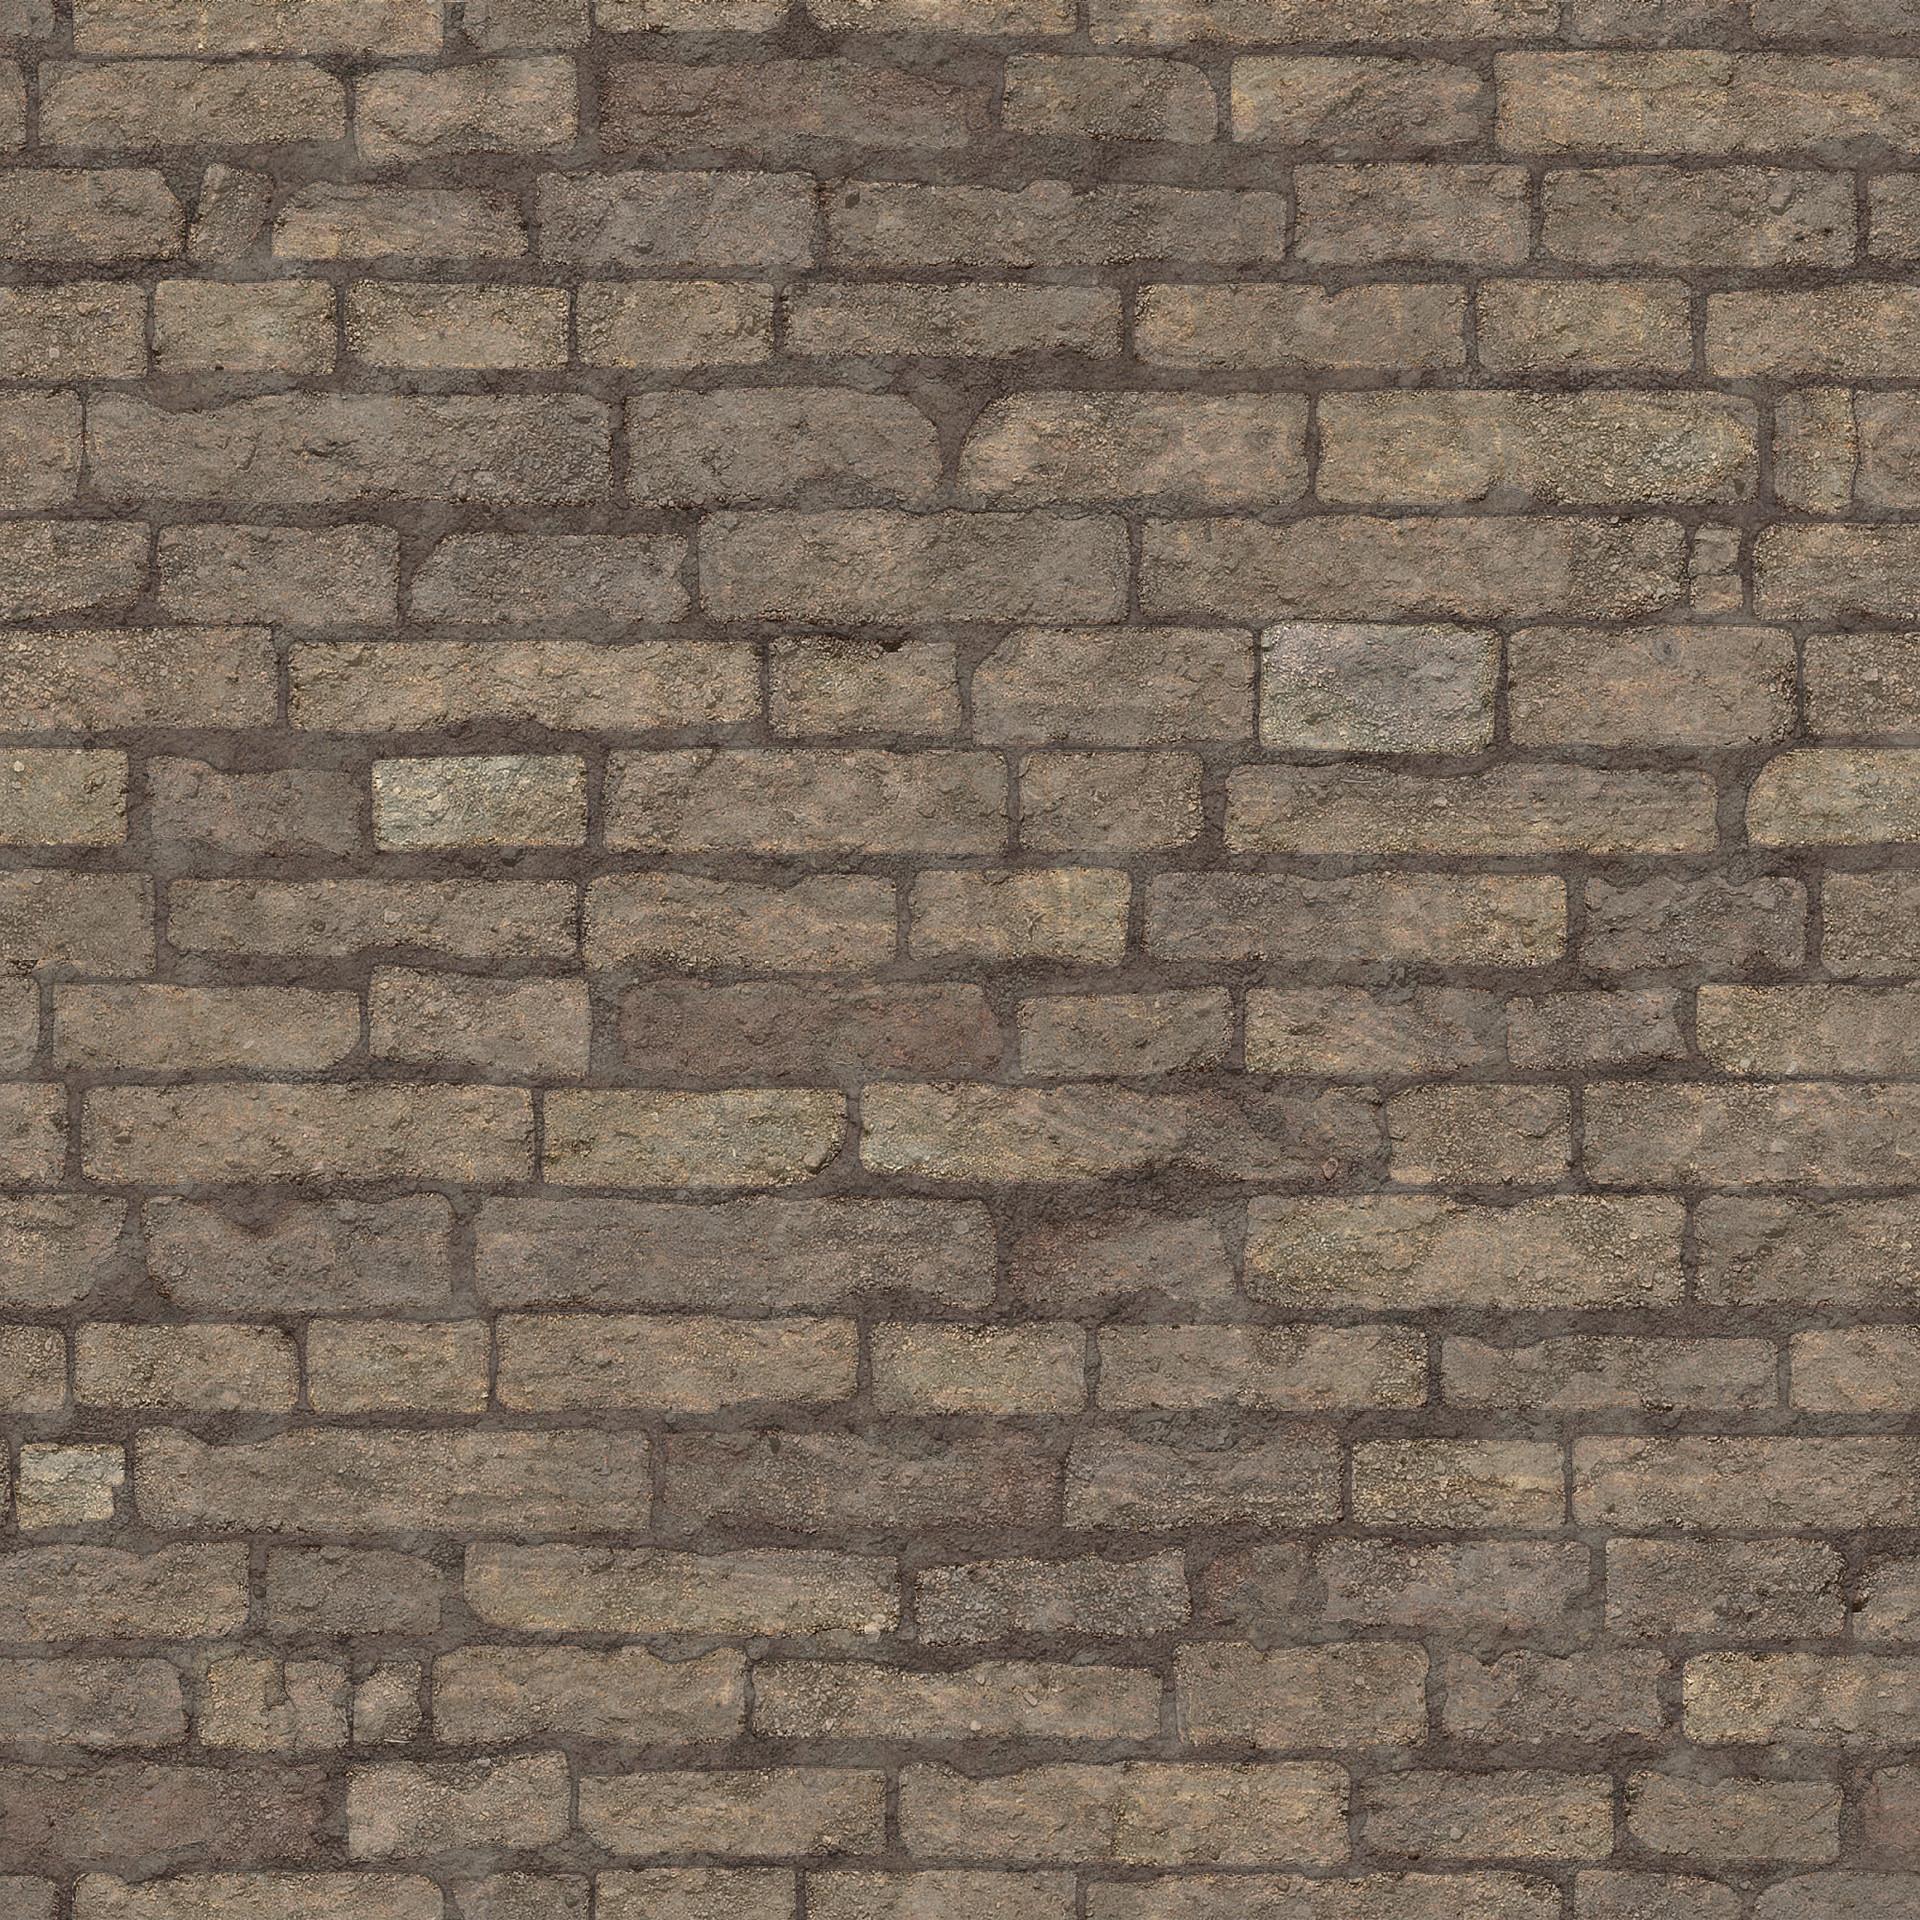 Akash dholakia tiling brick textures wip